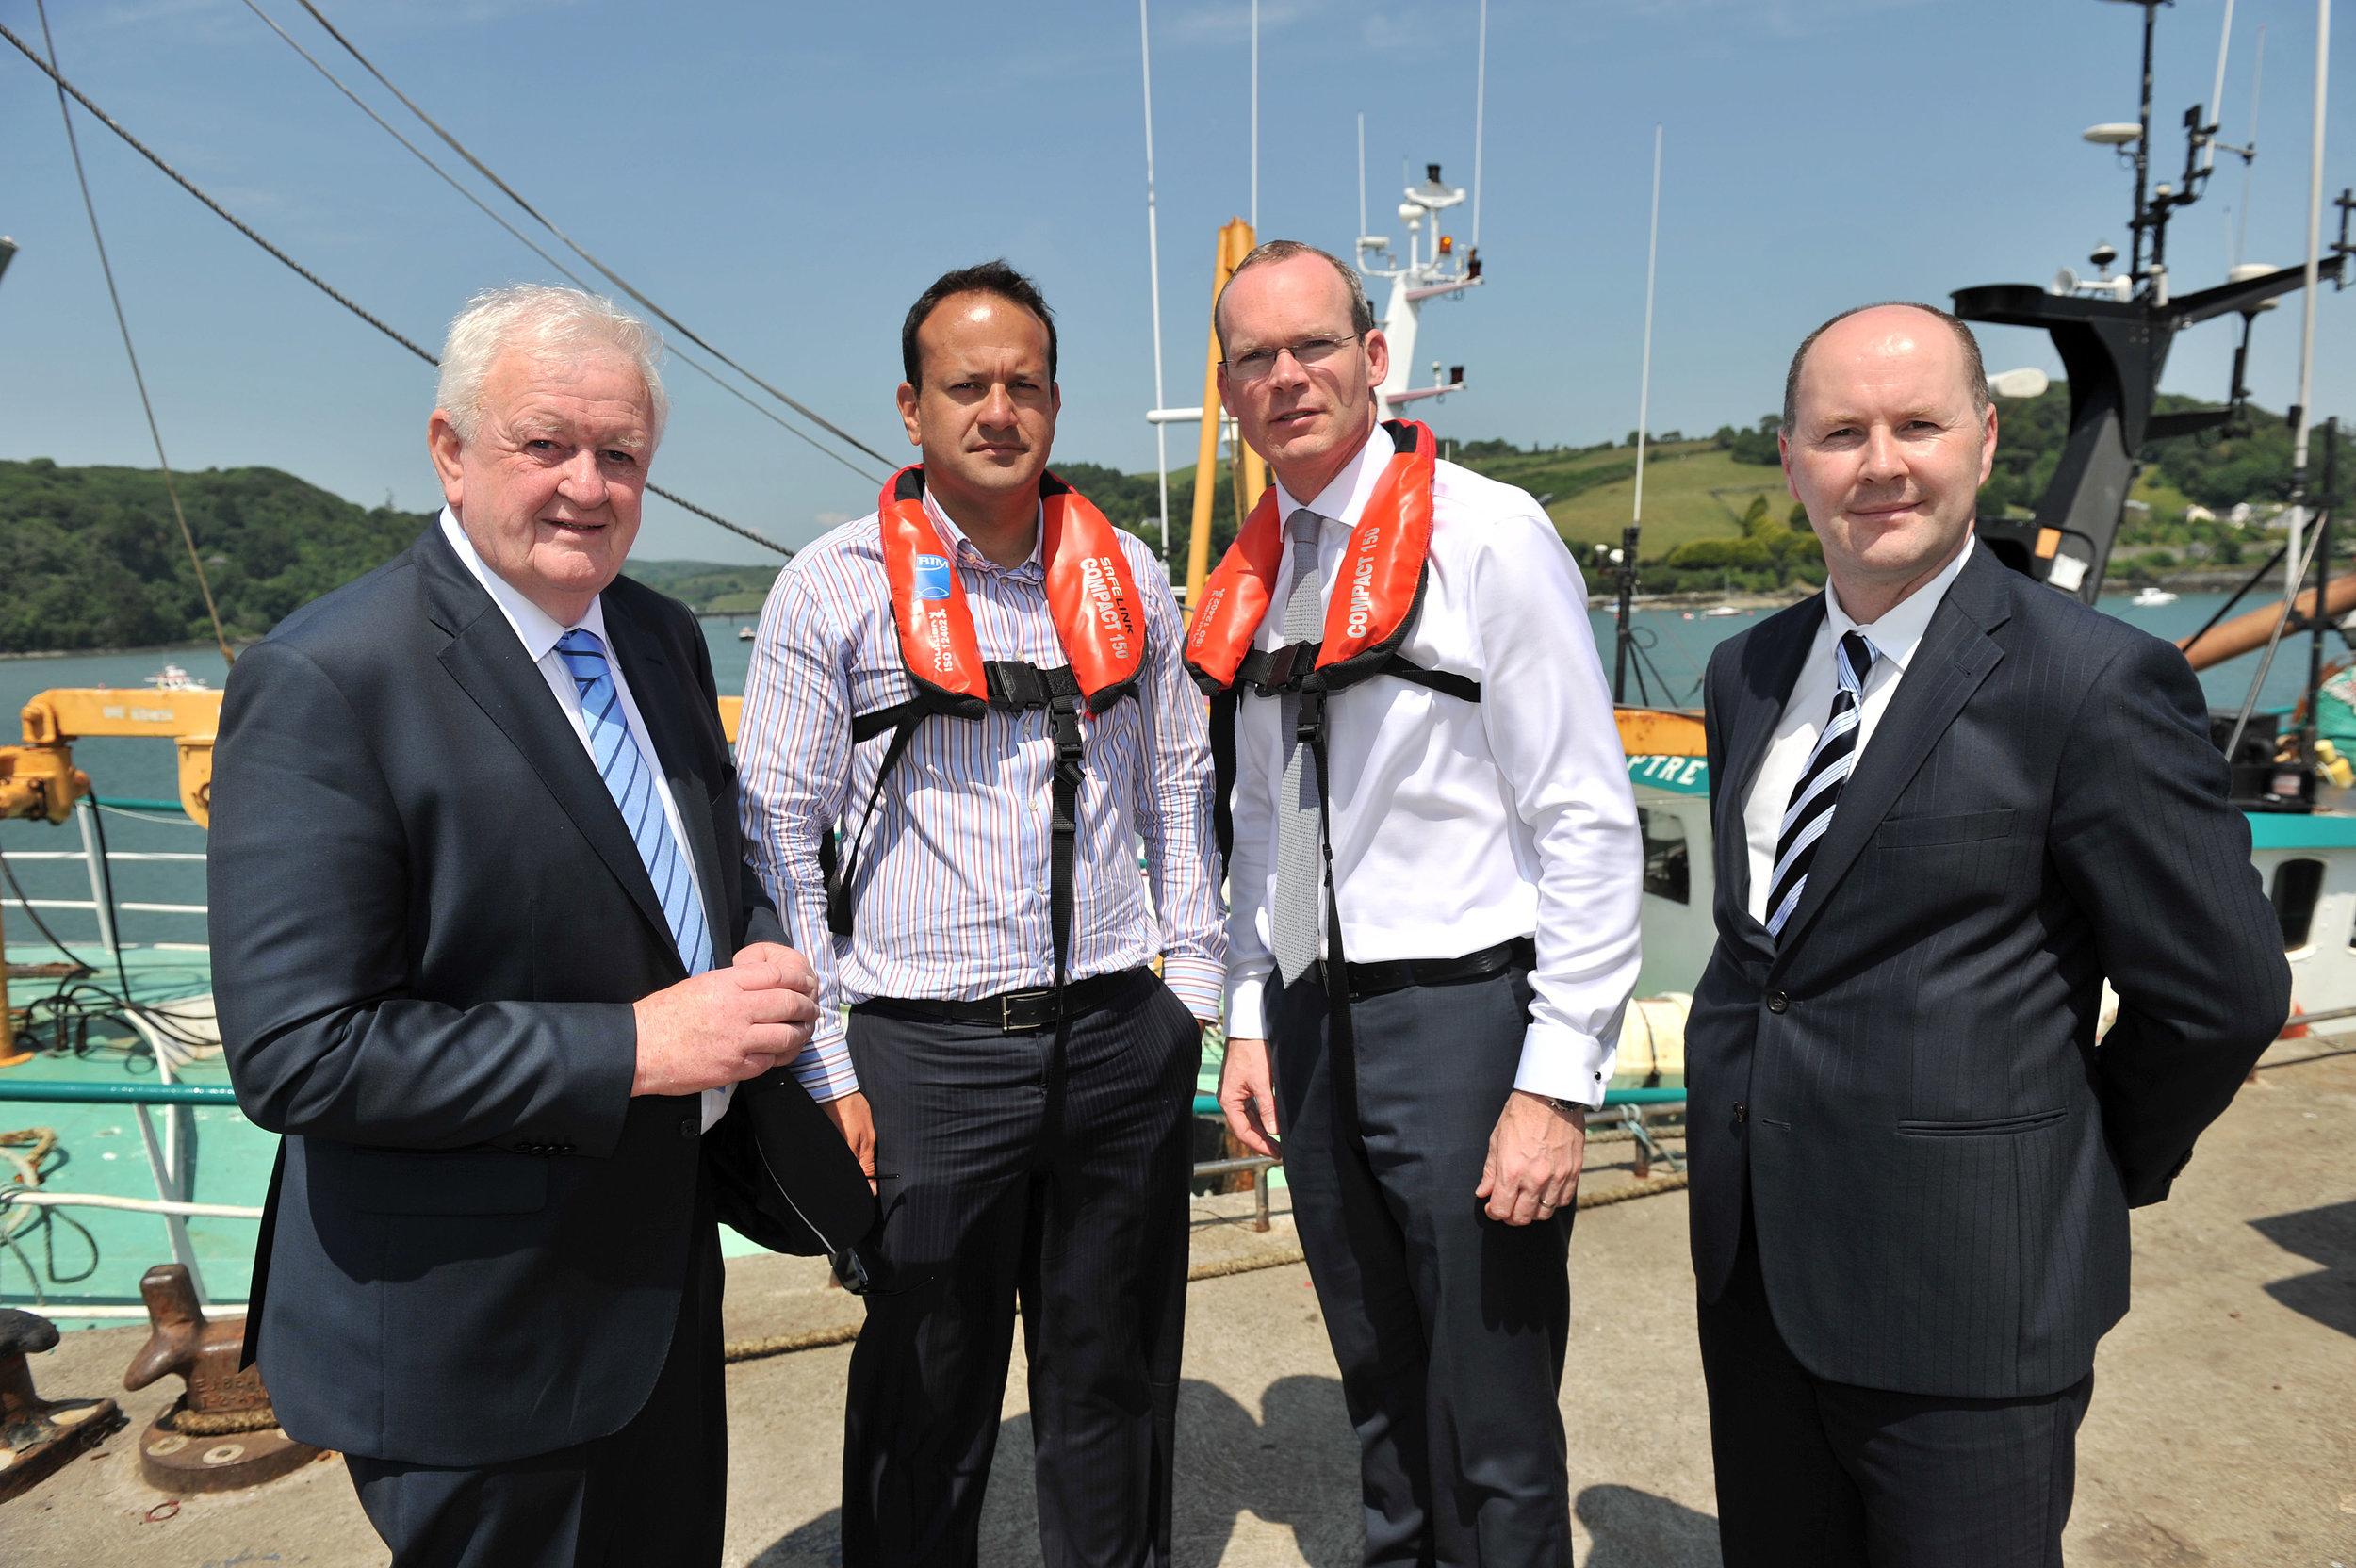 Leo Varadkar (middle left) & Simon Coveney (middle right). Image from leovaradkar.ie